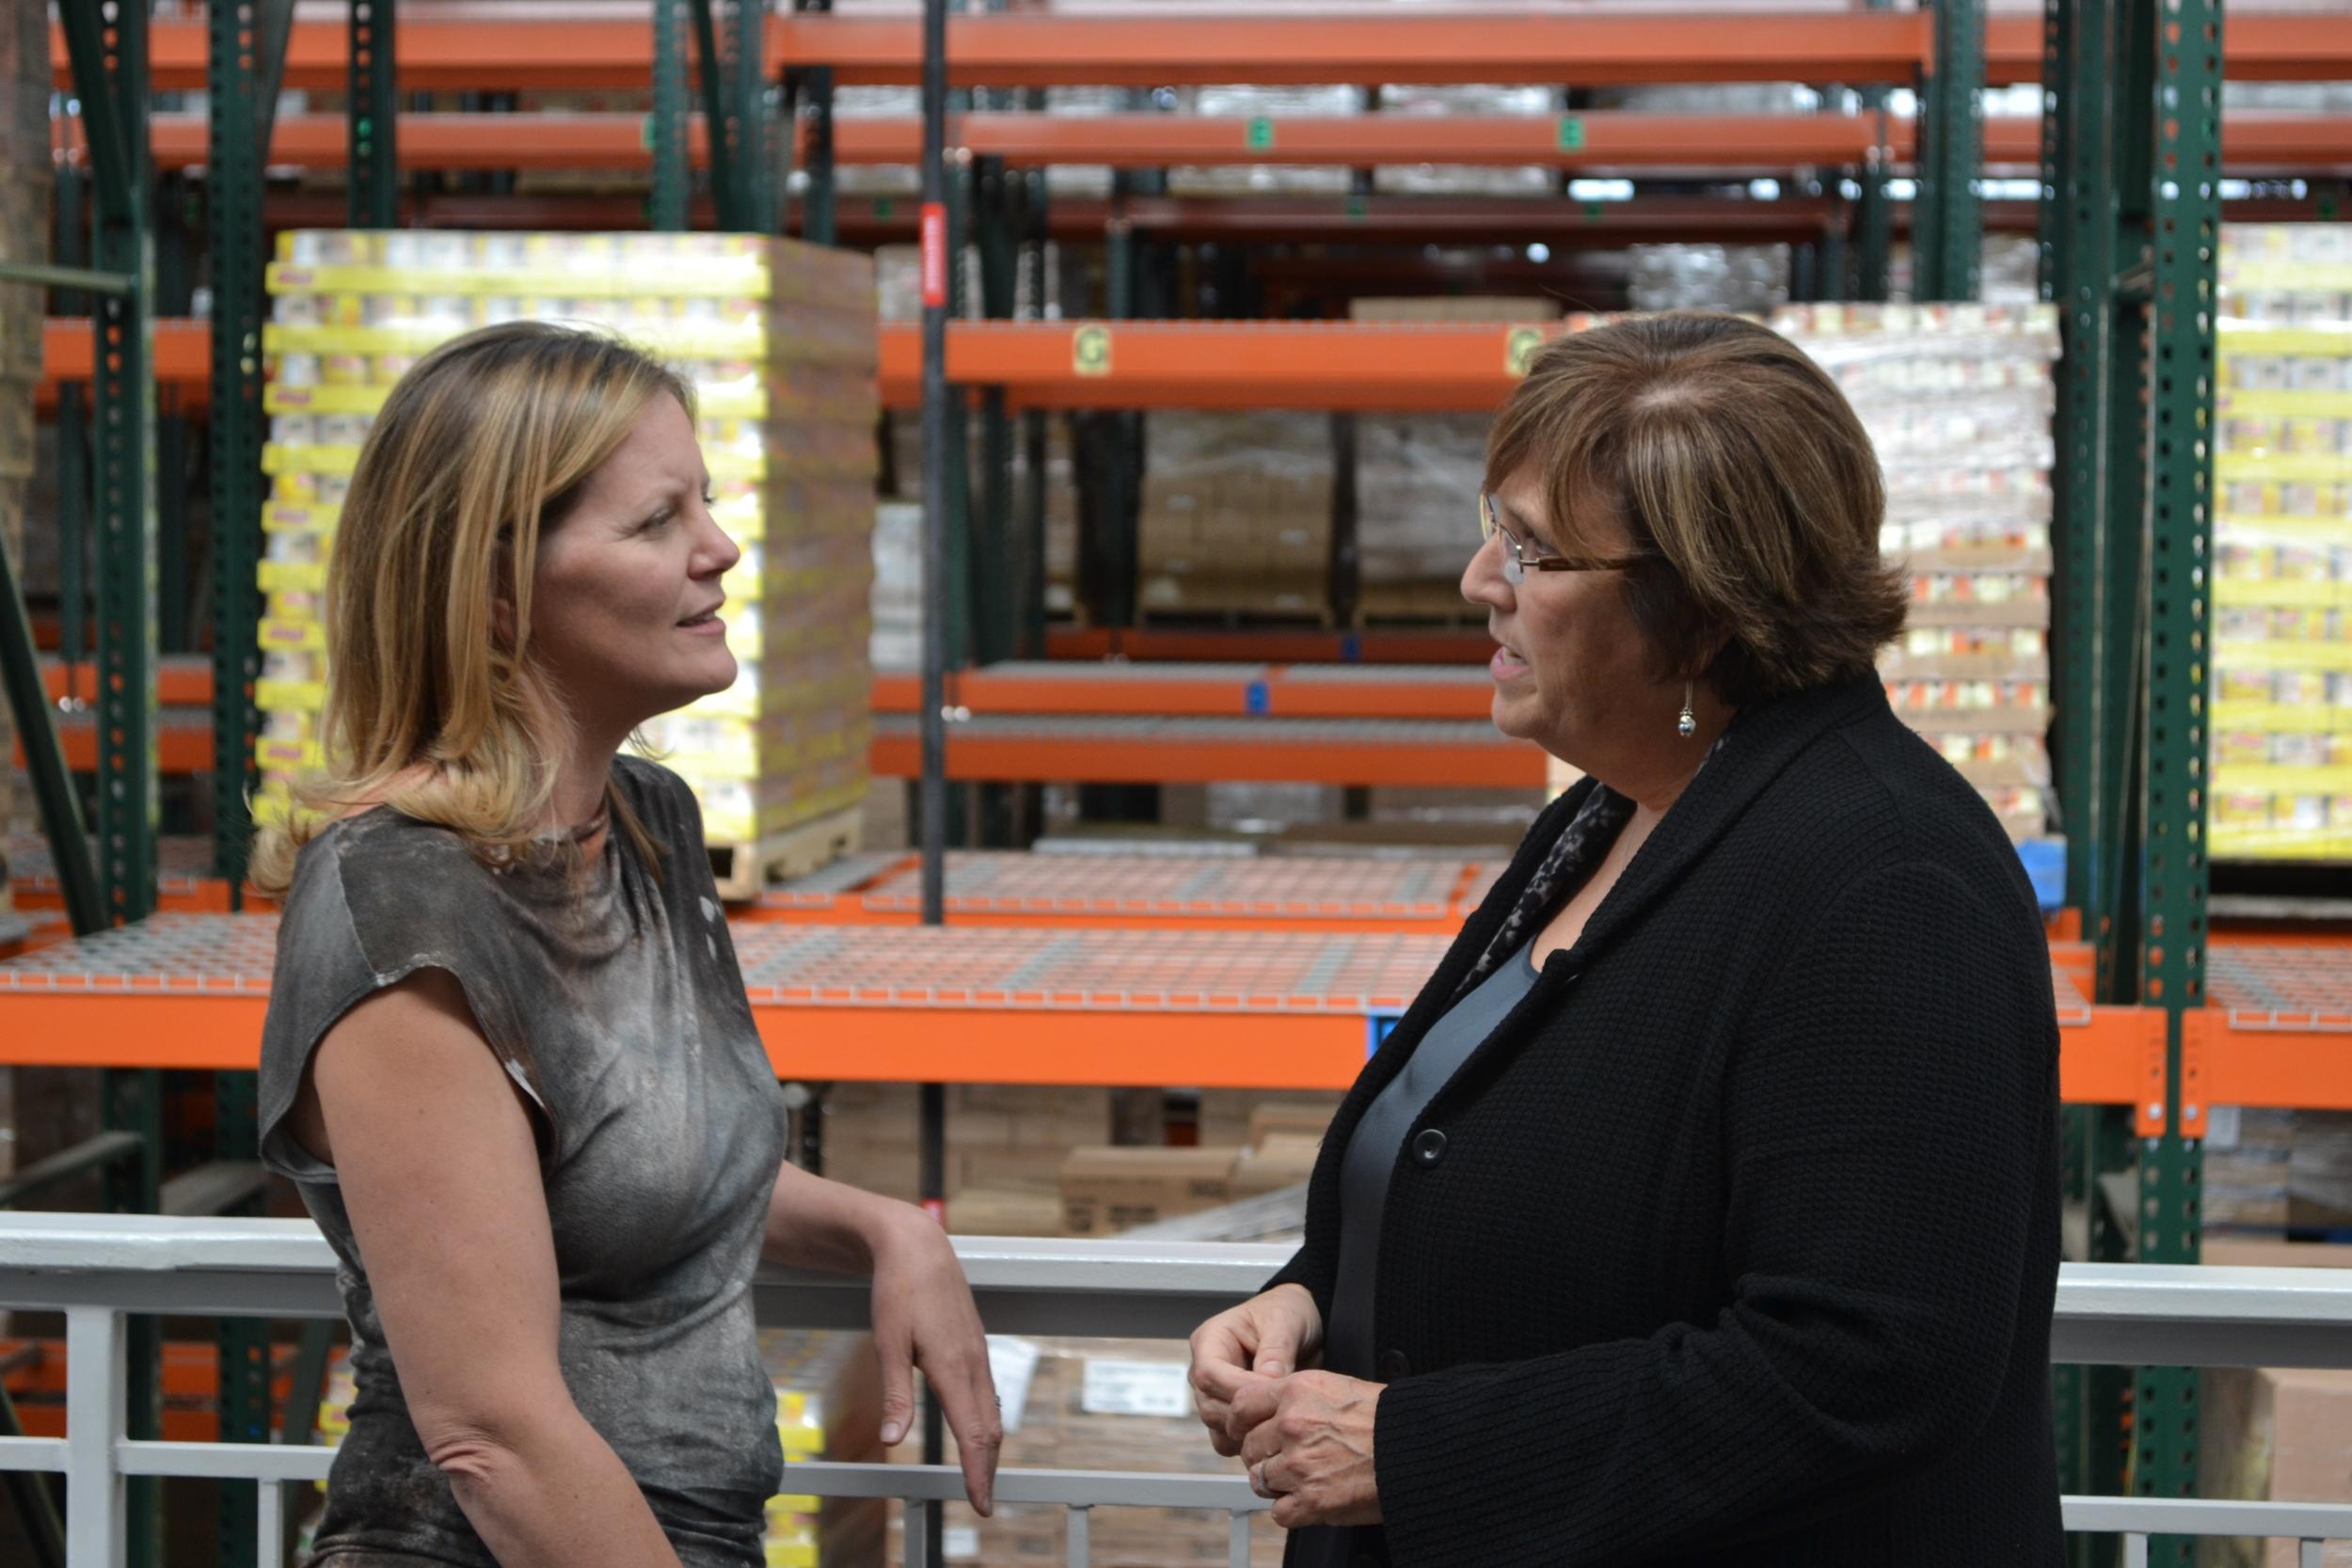 Heidi Legg speaks to Catherine D'Amato, President of The Greater Boston Food Bank inside the 21st century facility